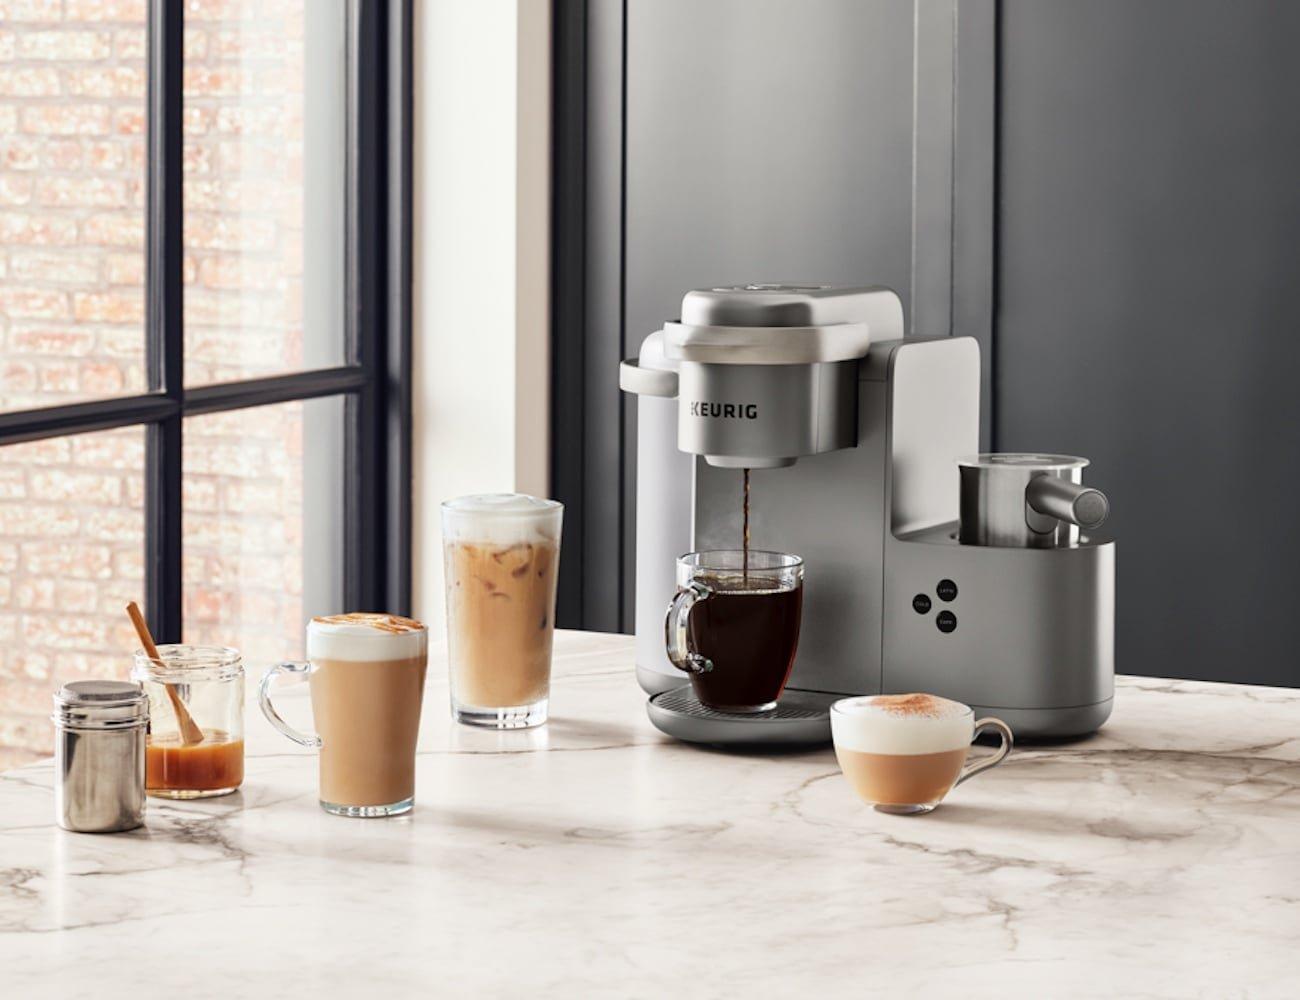 Keurig K-Café Single Serve Coffee Maker